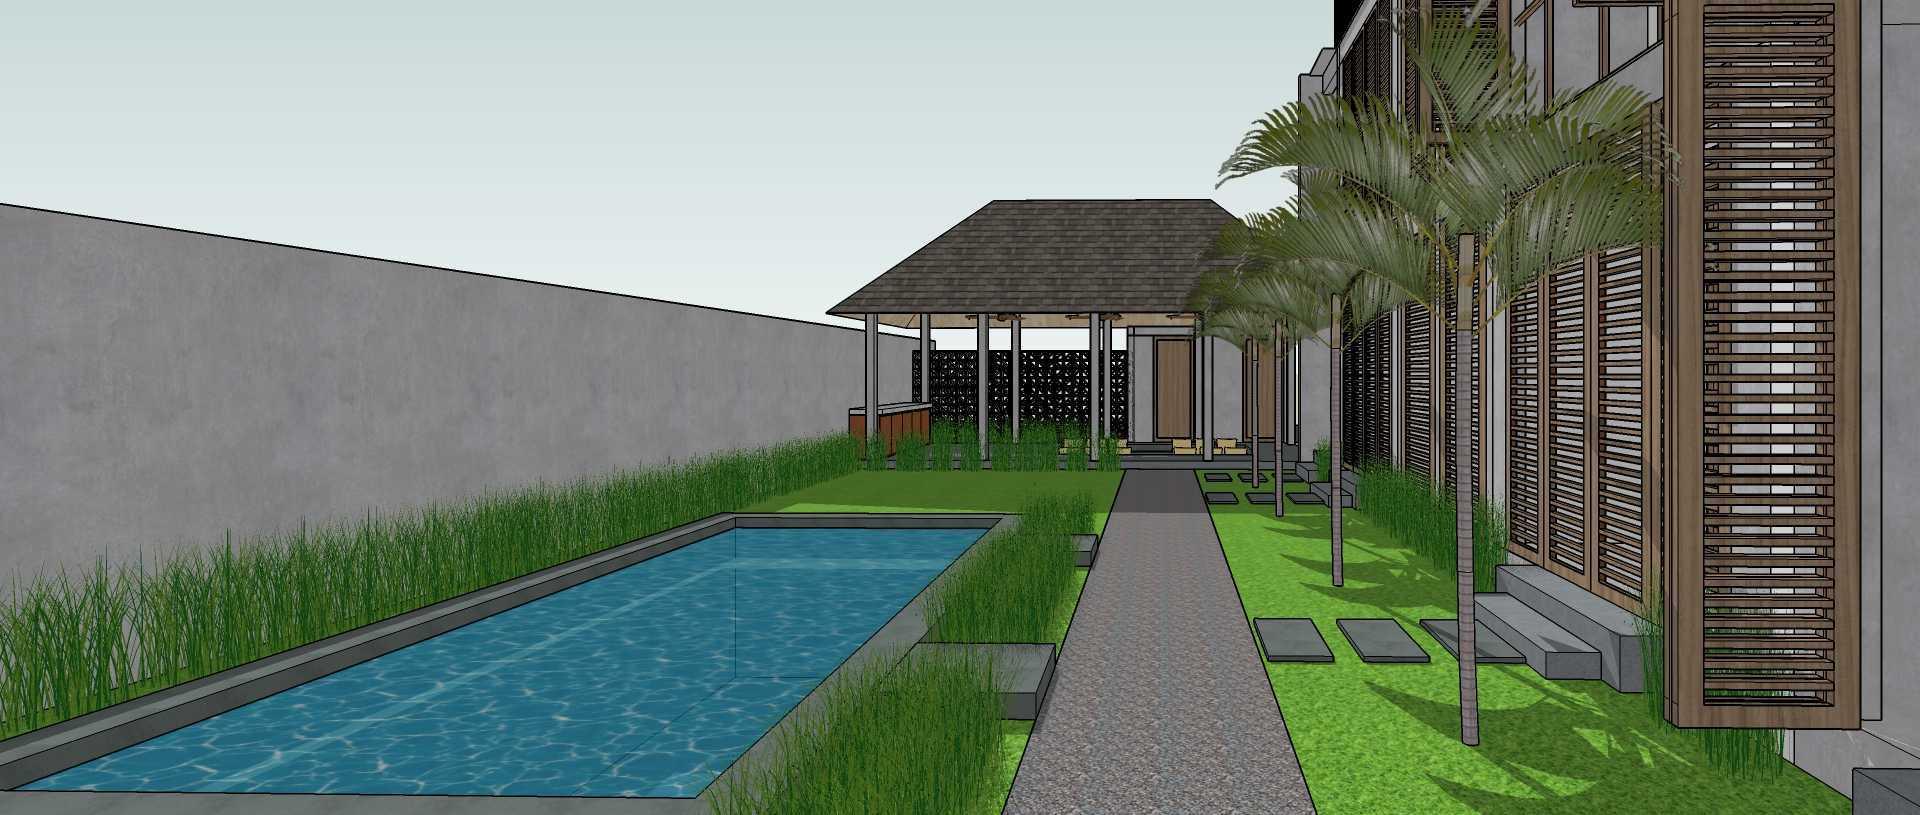 Studio Asri Bed & Breakfast Bali, Indonesia Bali, Indonesia Studio-Asri-Bed-N-Breakfast  66553